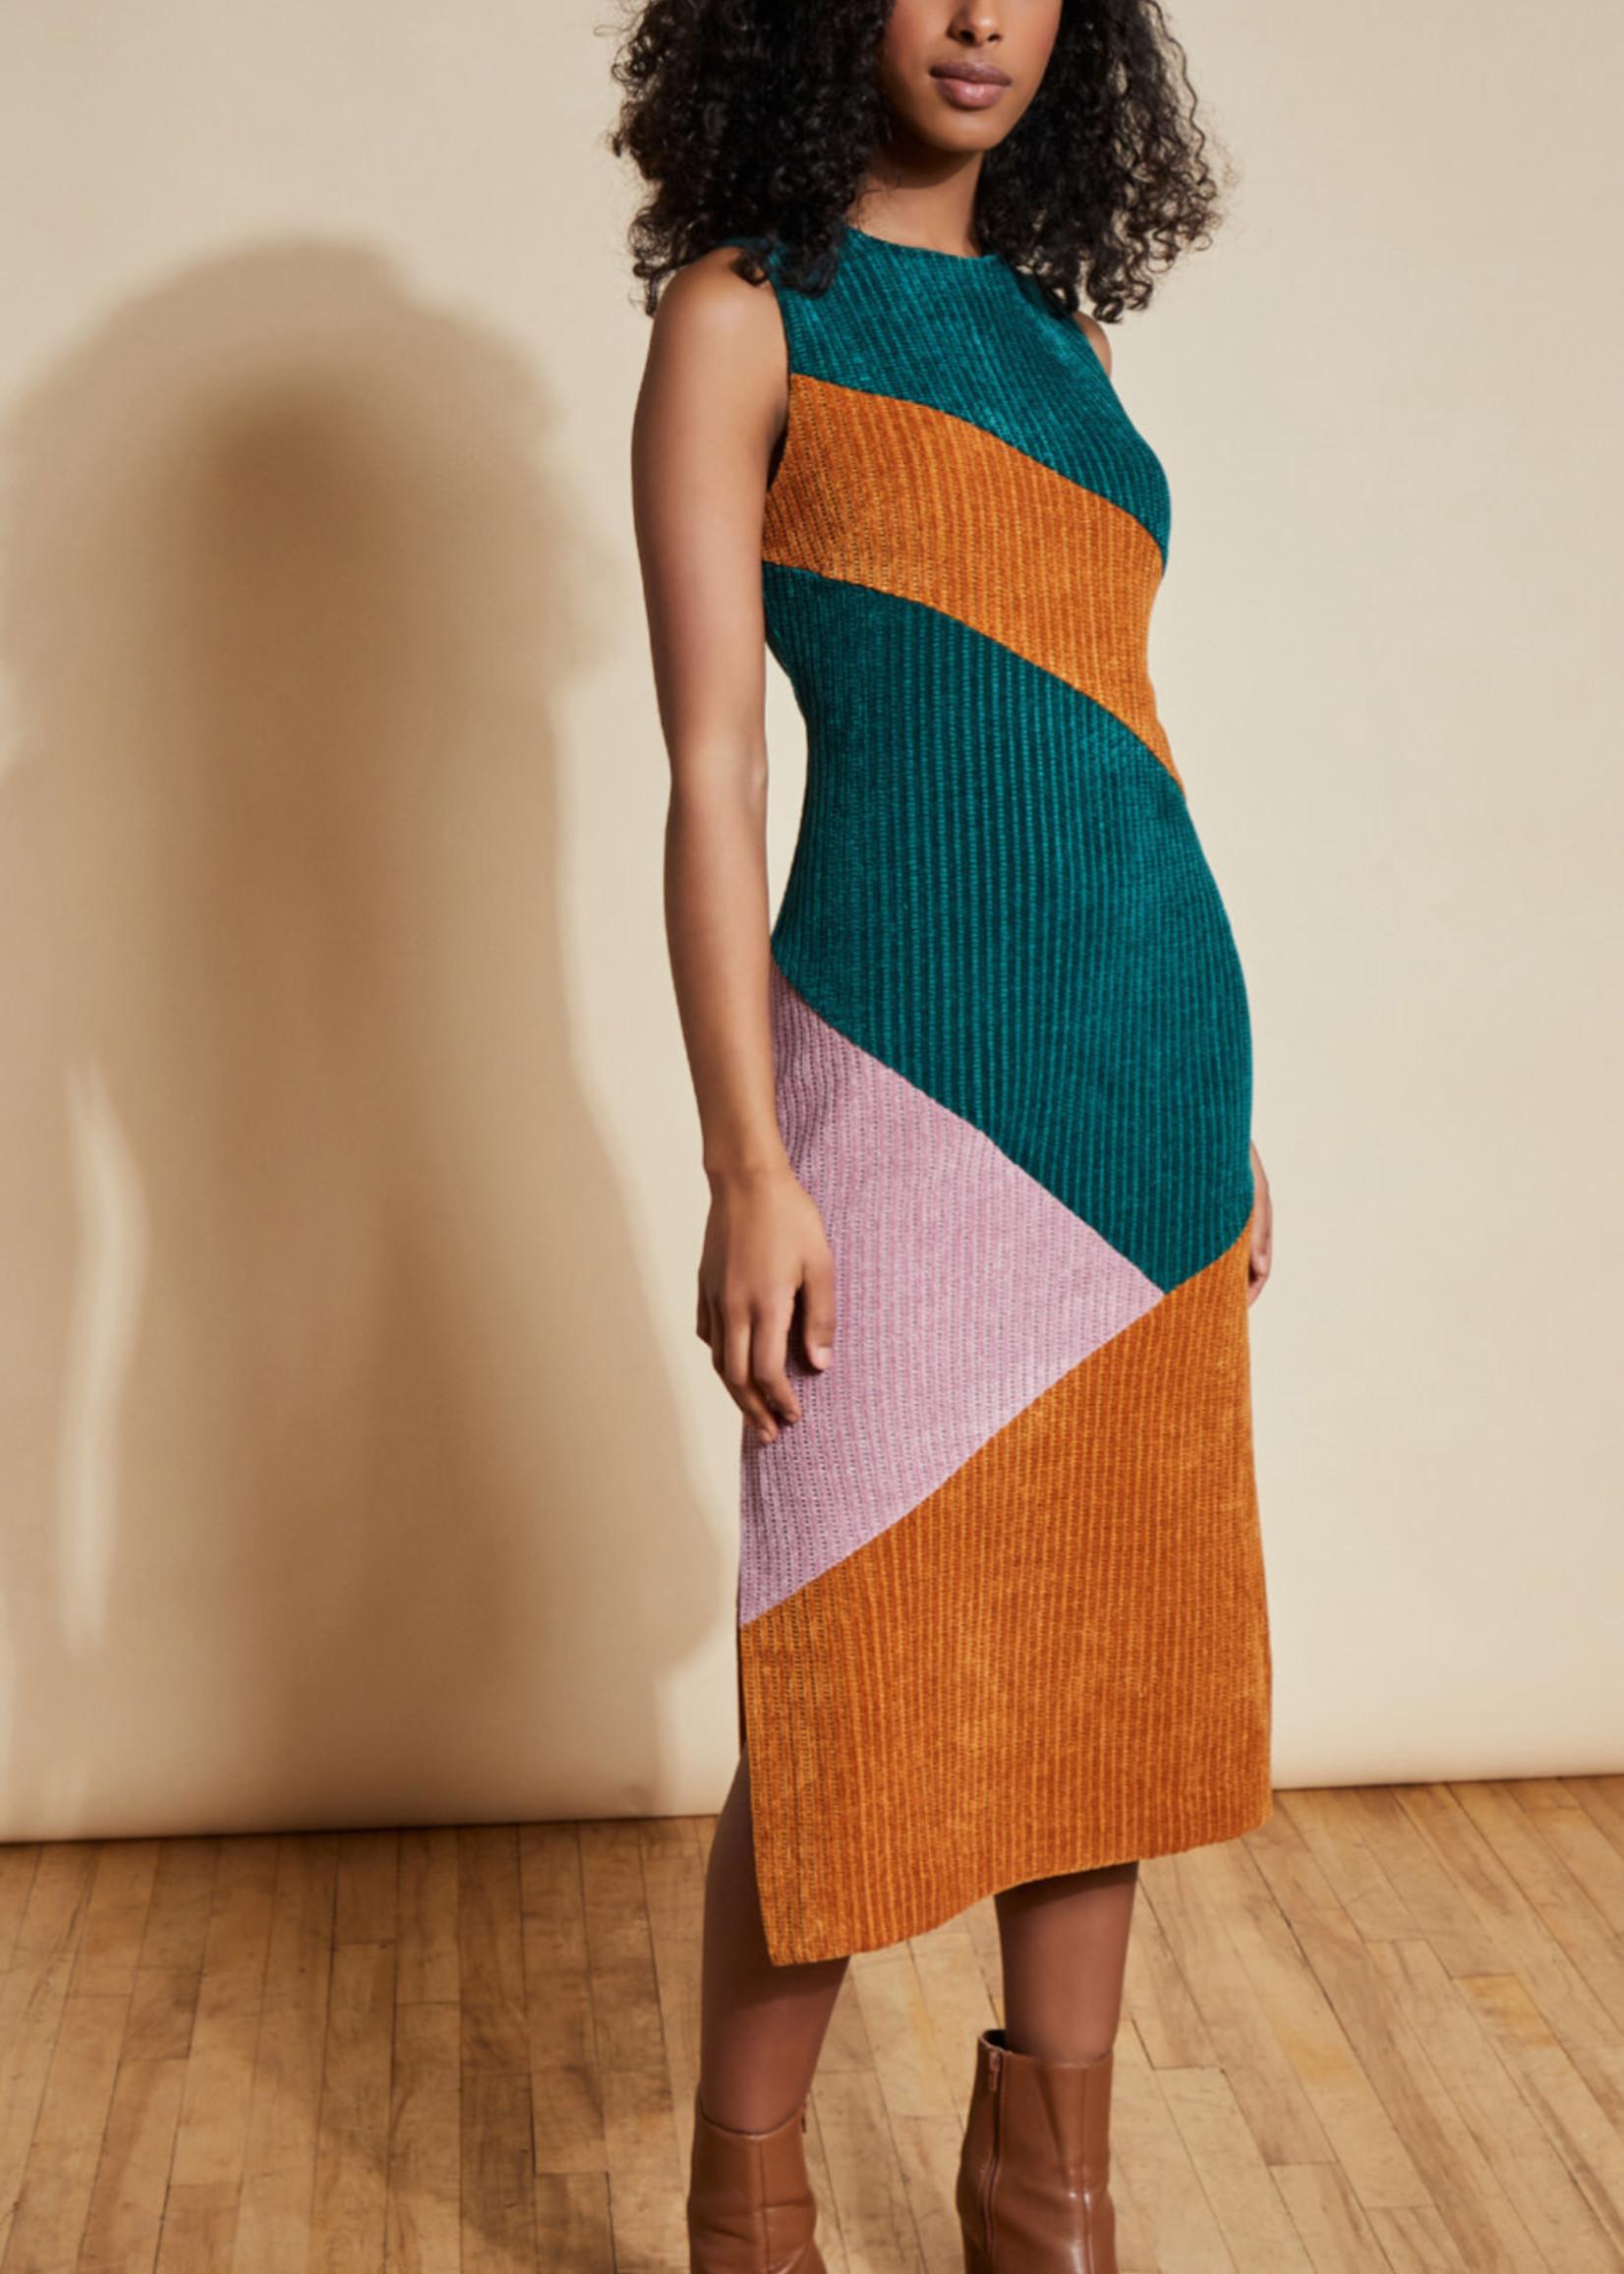 Hutch Jordy Chenille Dress